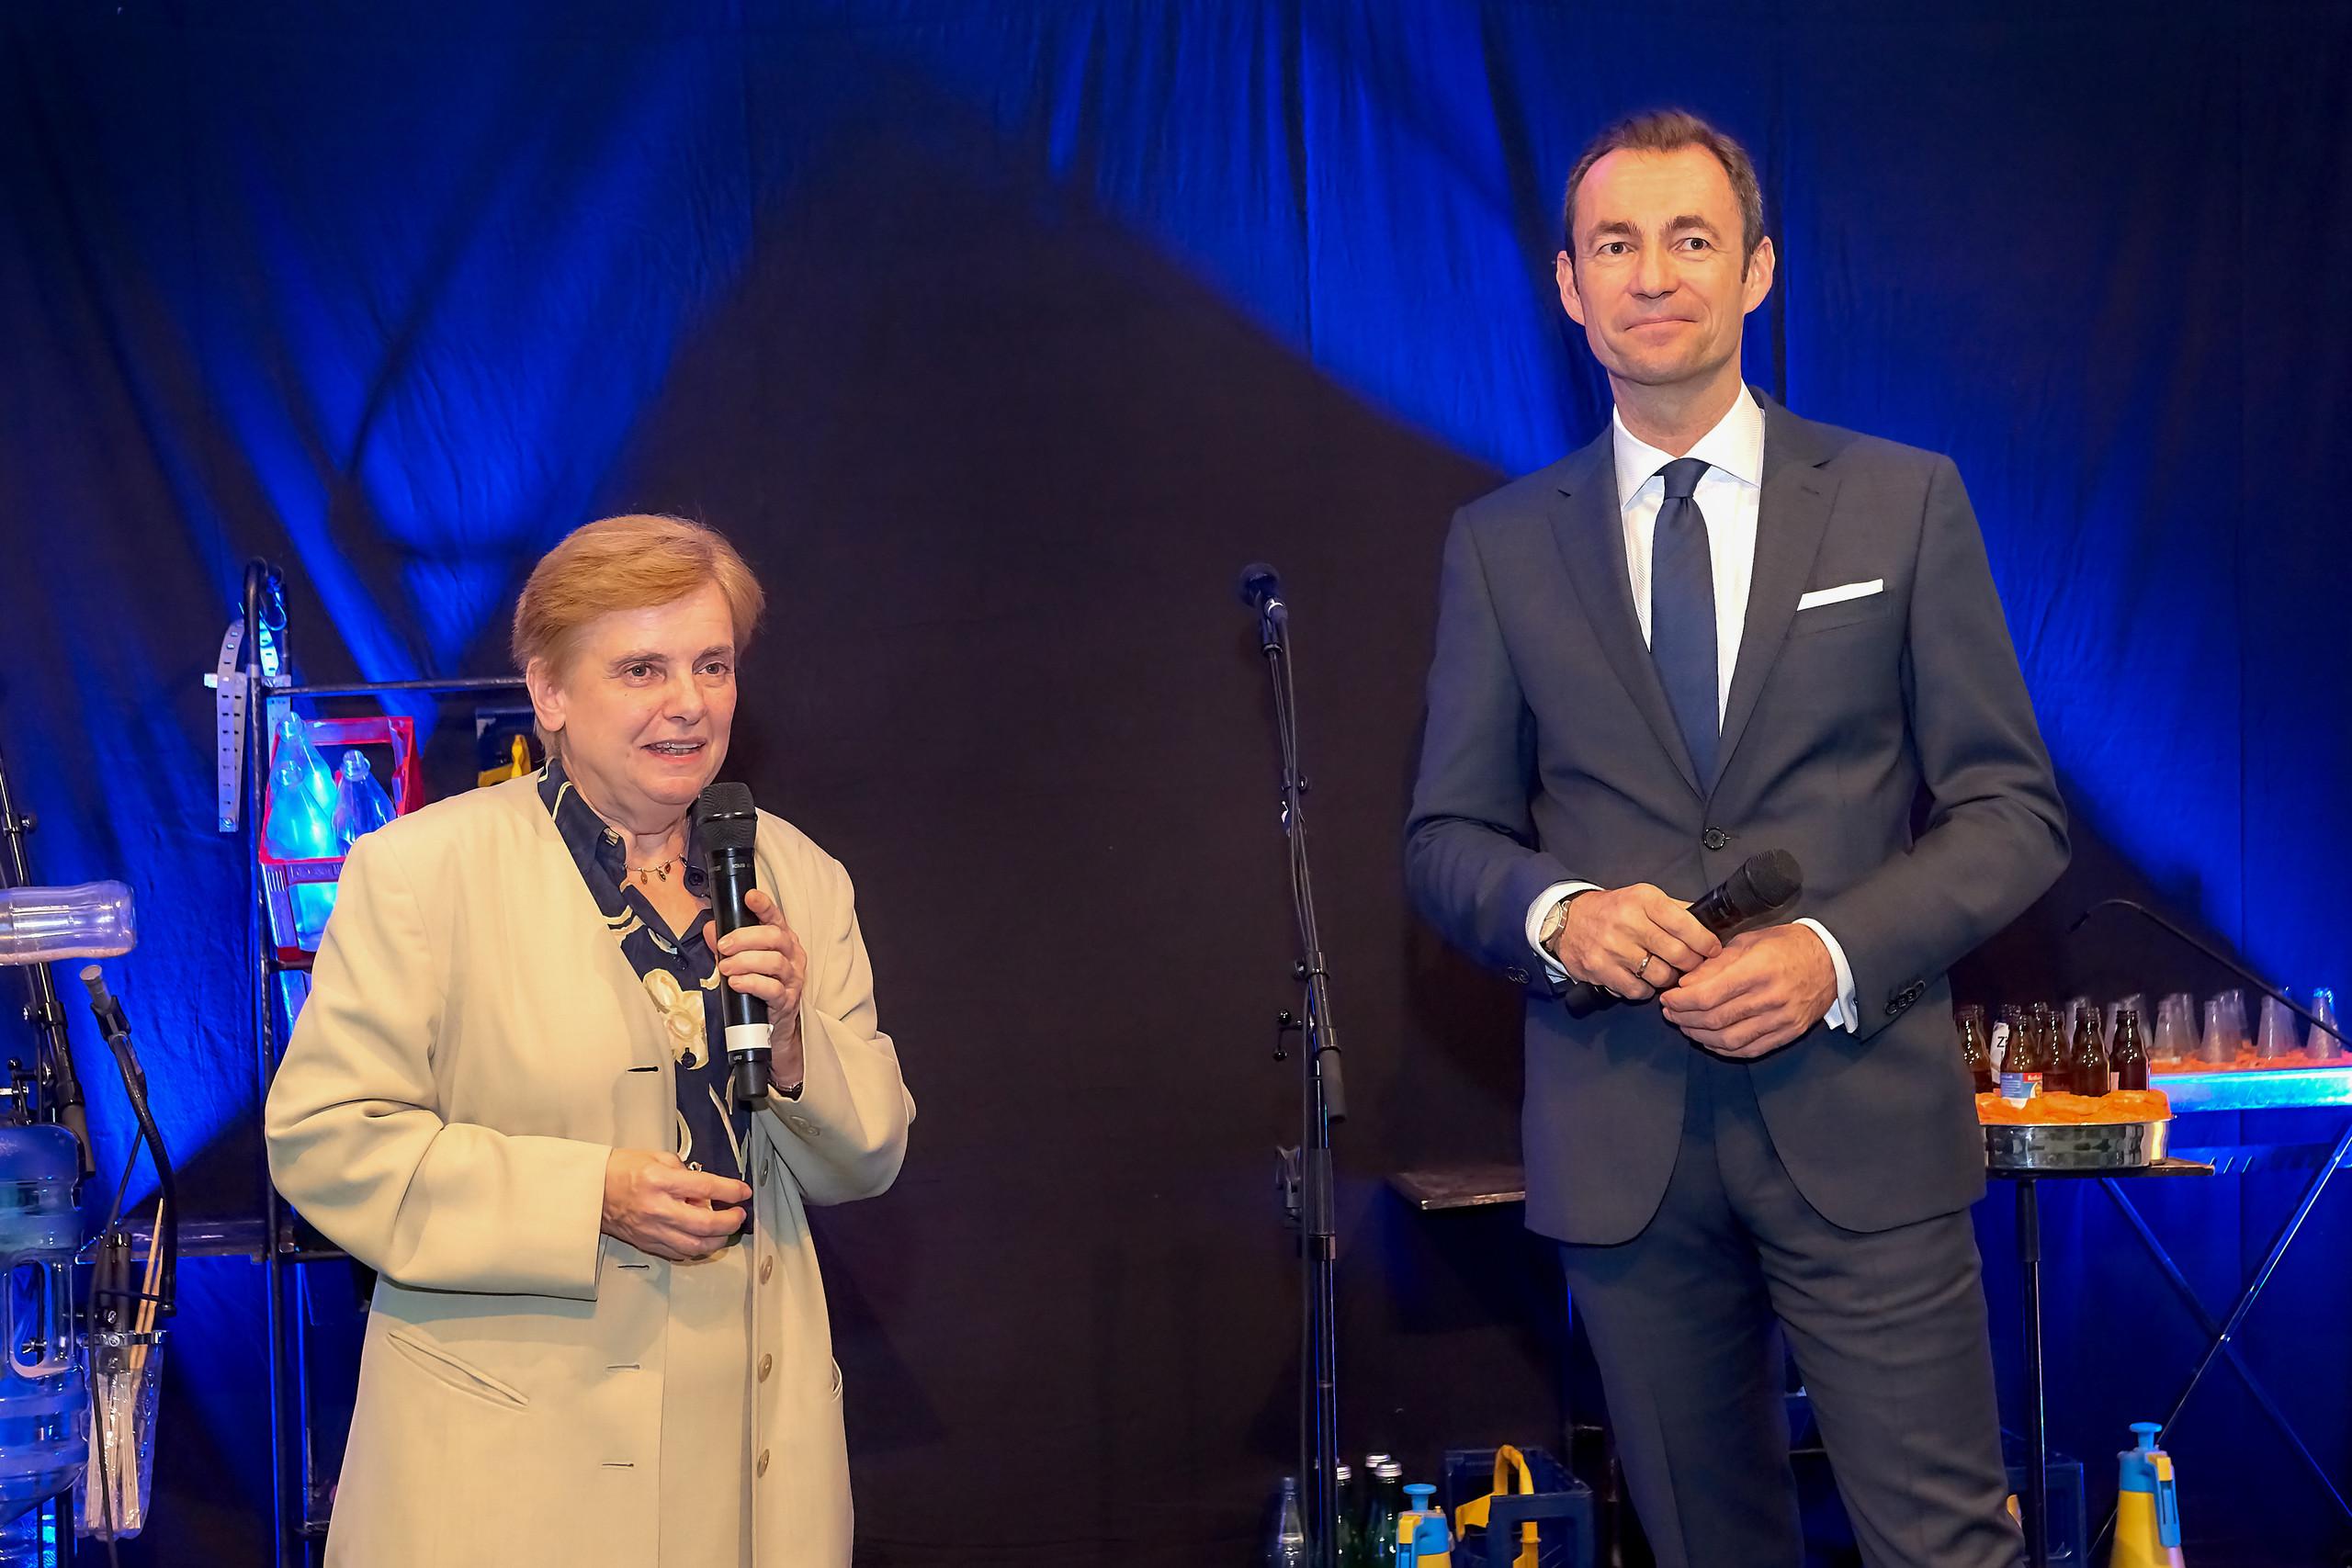 40 Jahre Glasrecyclingsystem in Österreich - Feier am 12. Oktober 2017